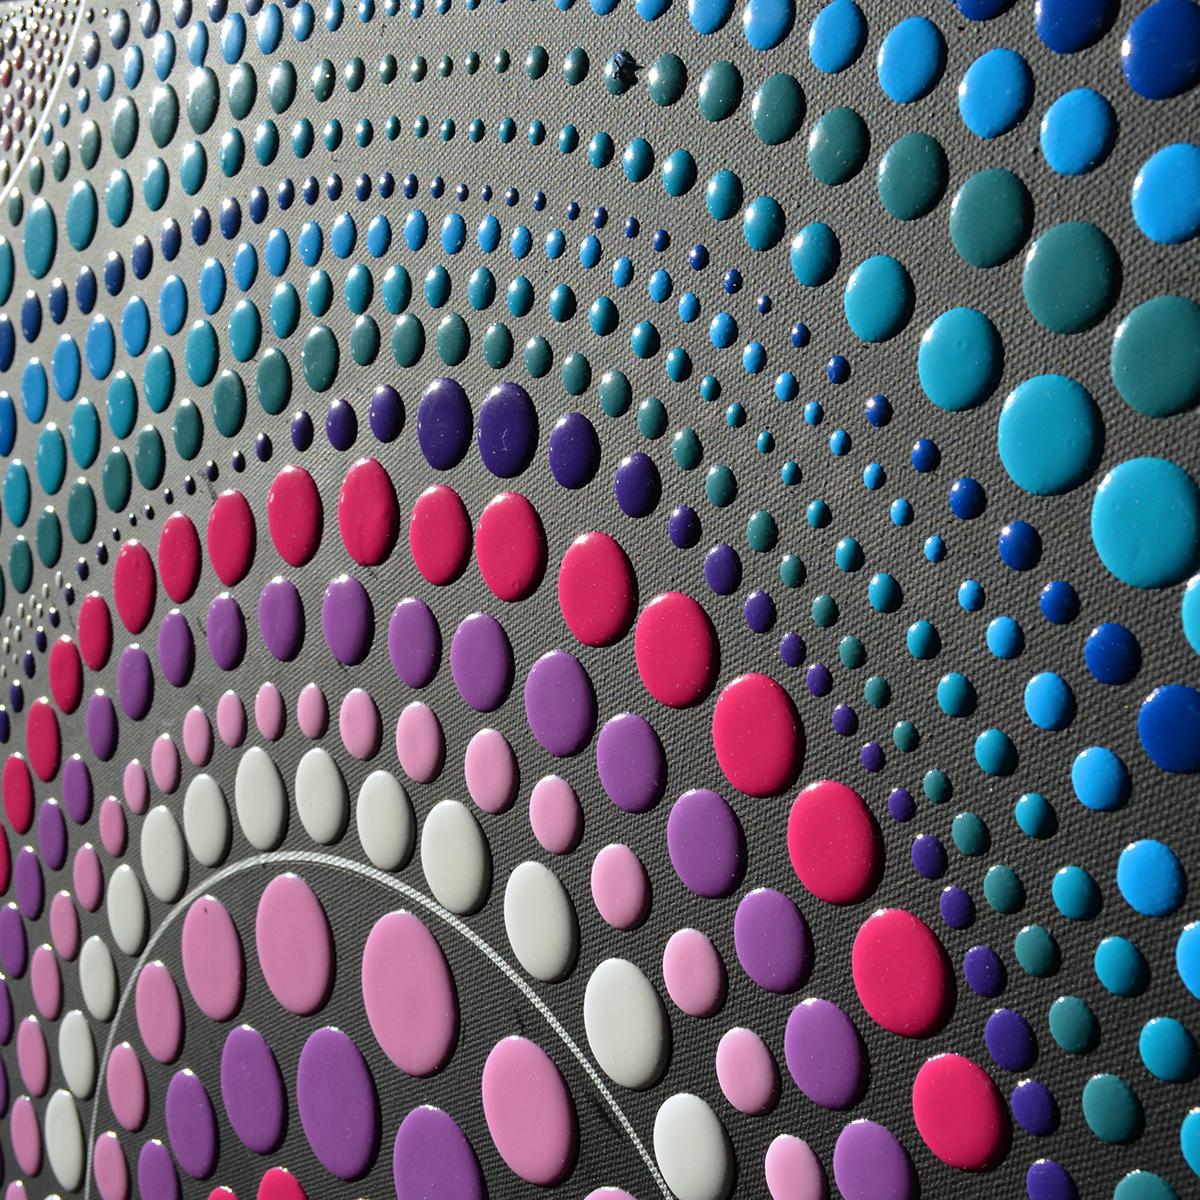 Blob Paint Bild - Wellen